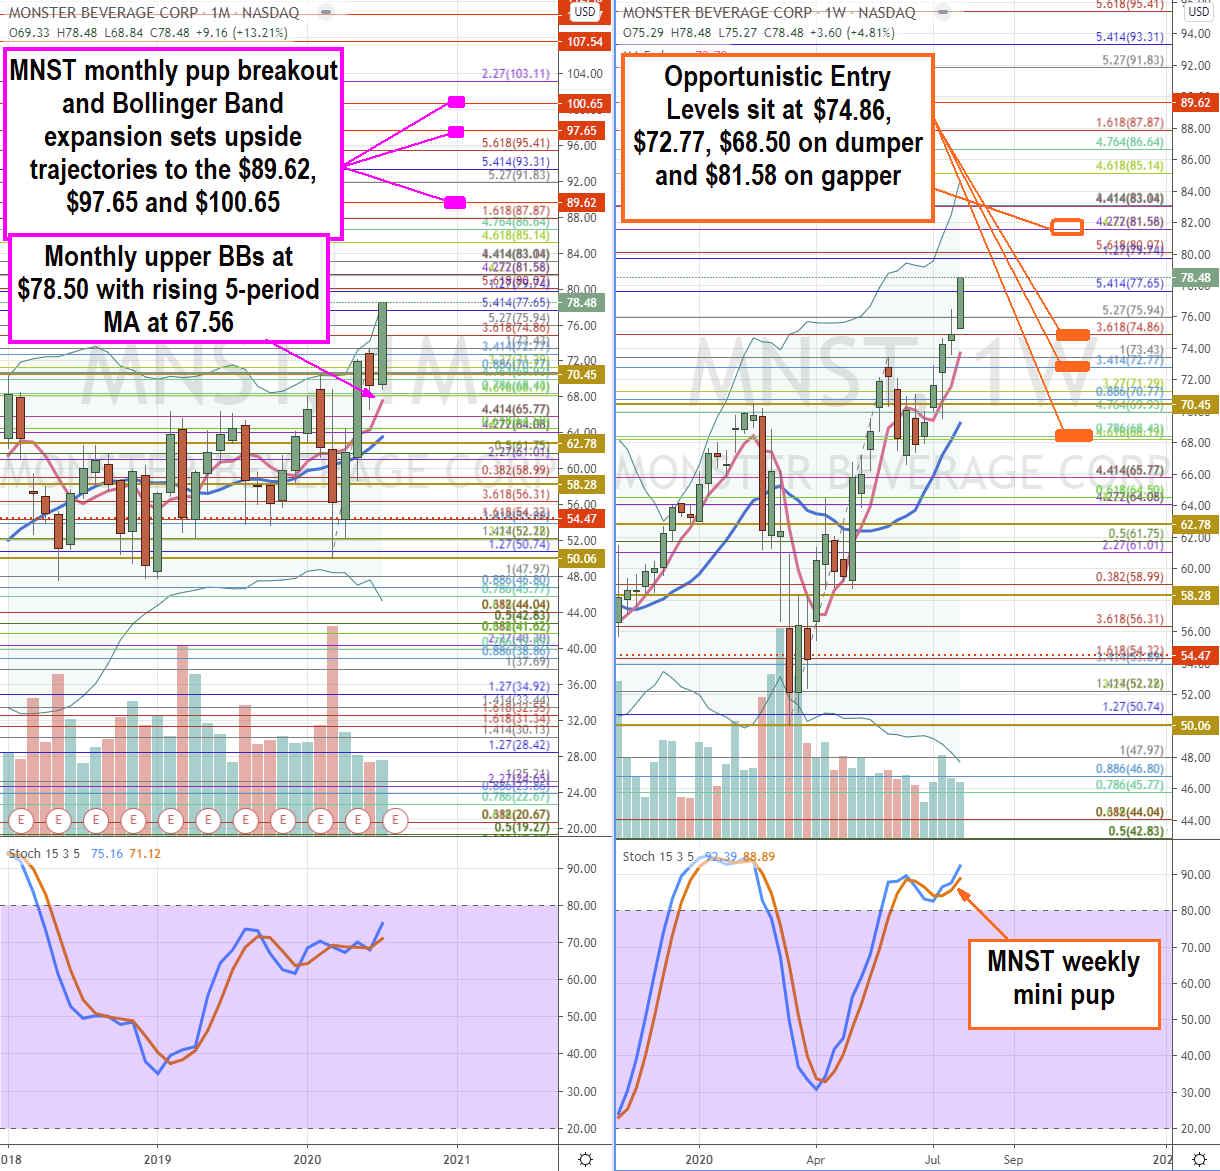 Monster Beverage (NASDAQ: MNST) Stock Setting Up Next Leg Higher